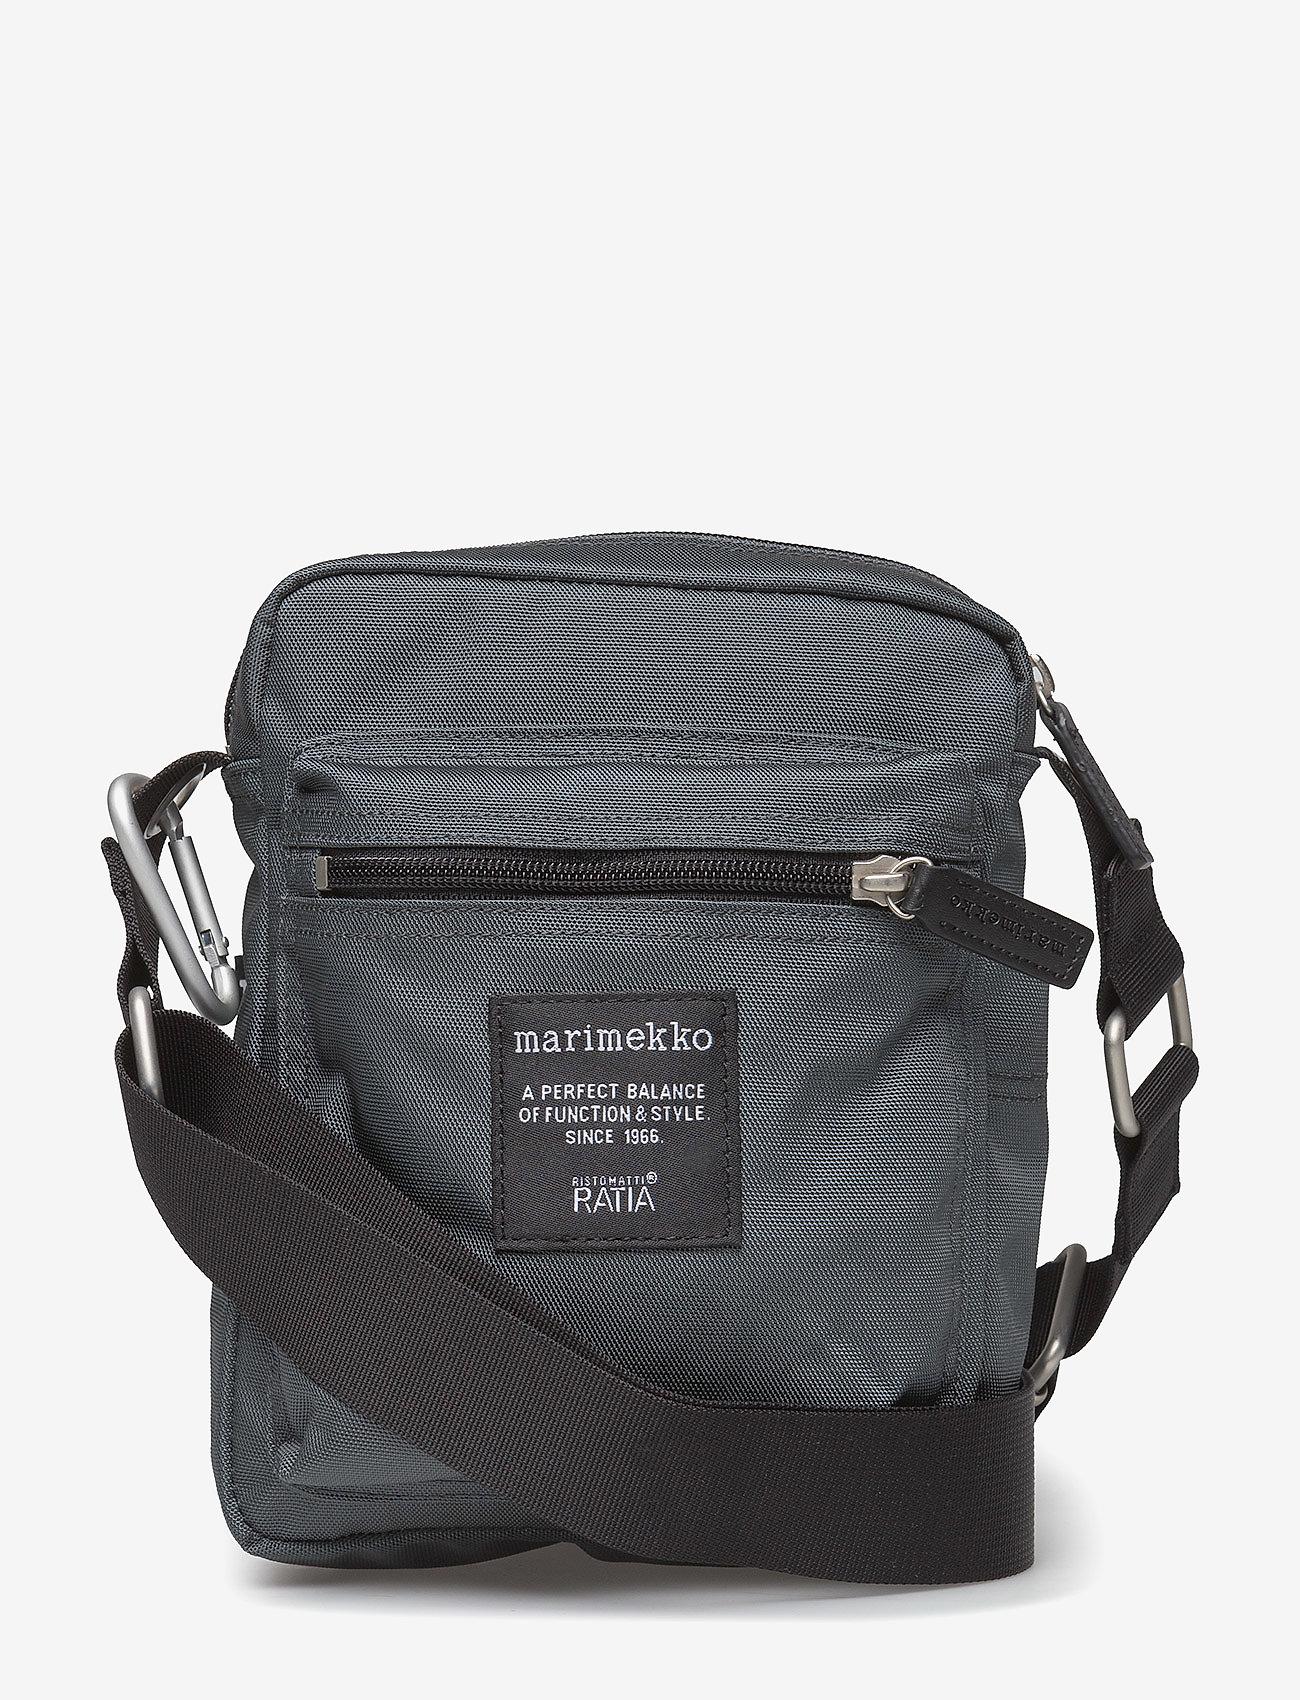 Marimekko - CASH & CARRY - crossbody bags - coal - 0